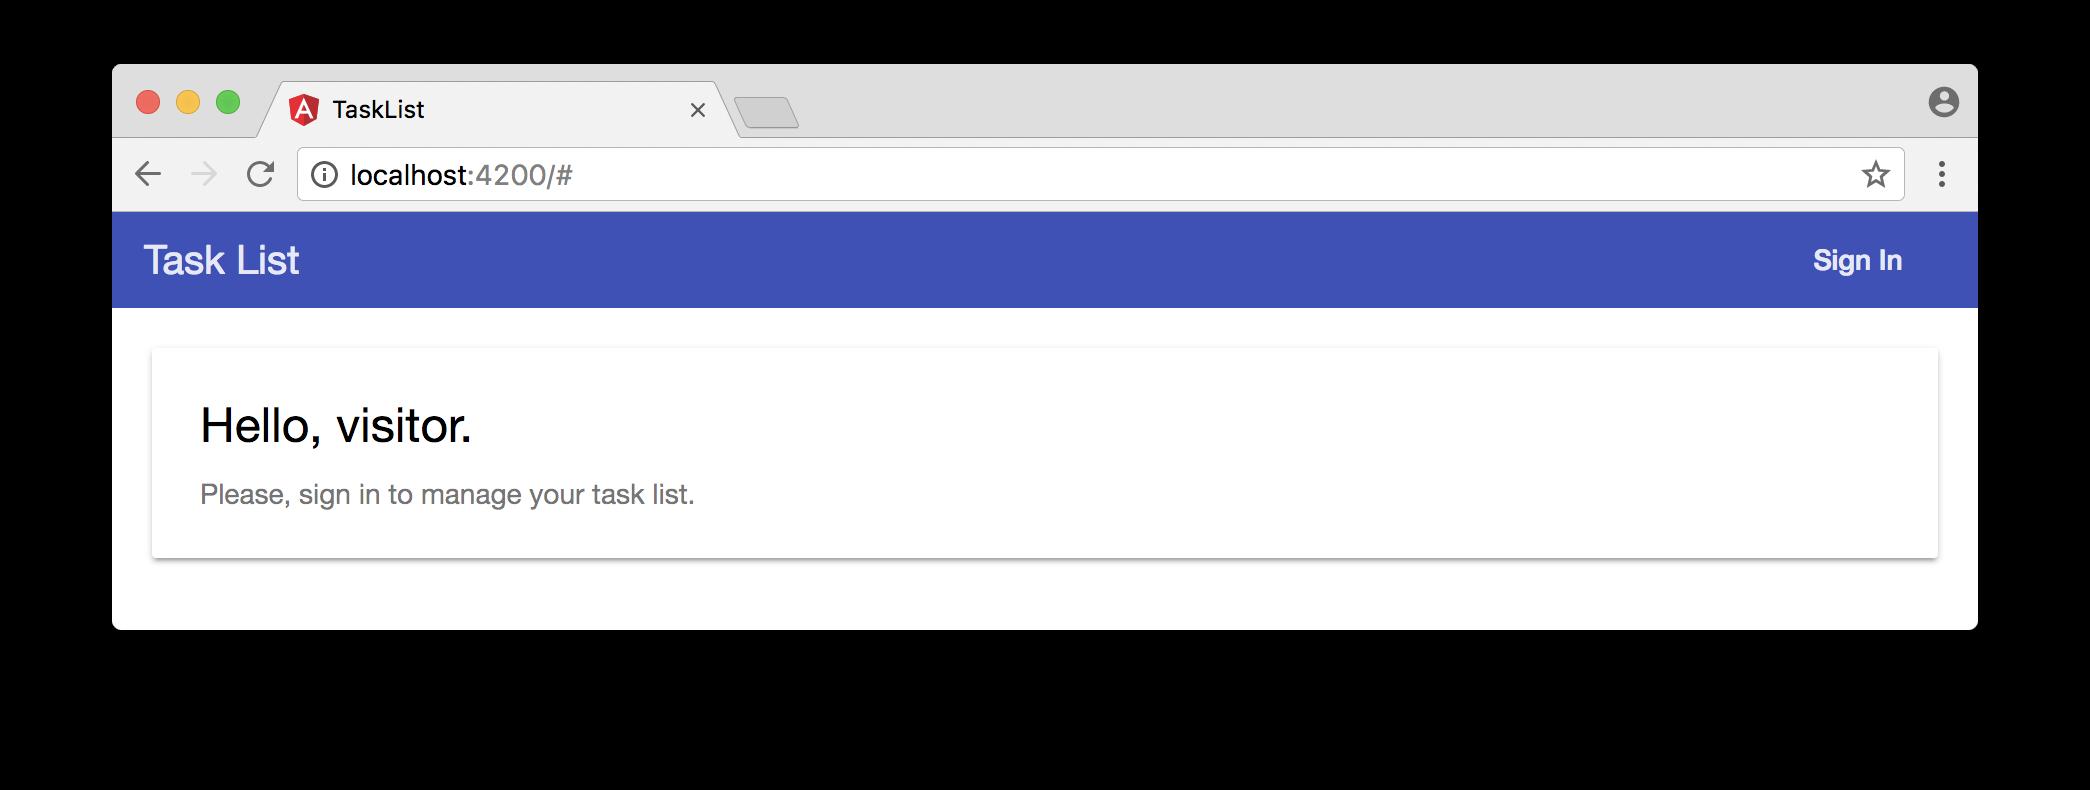 Welcome message on our Angular task list app